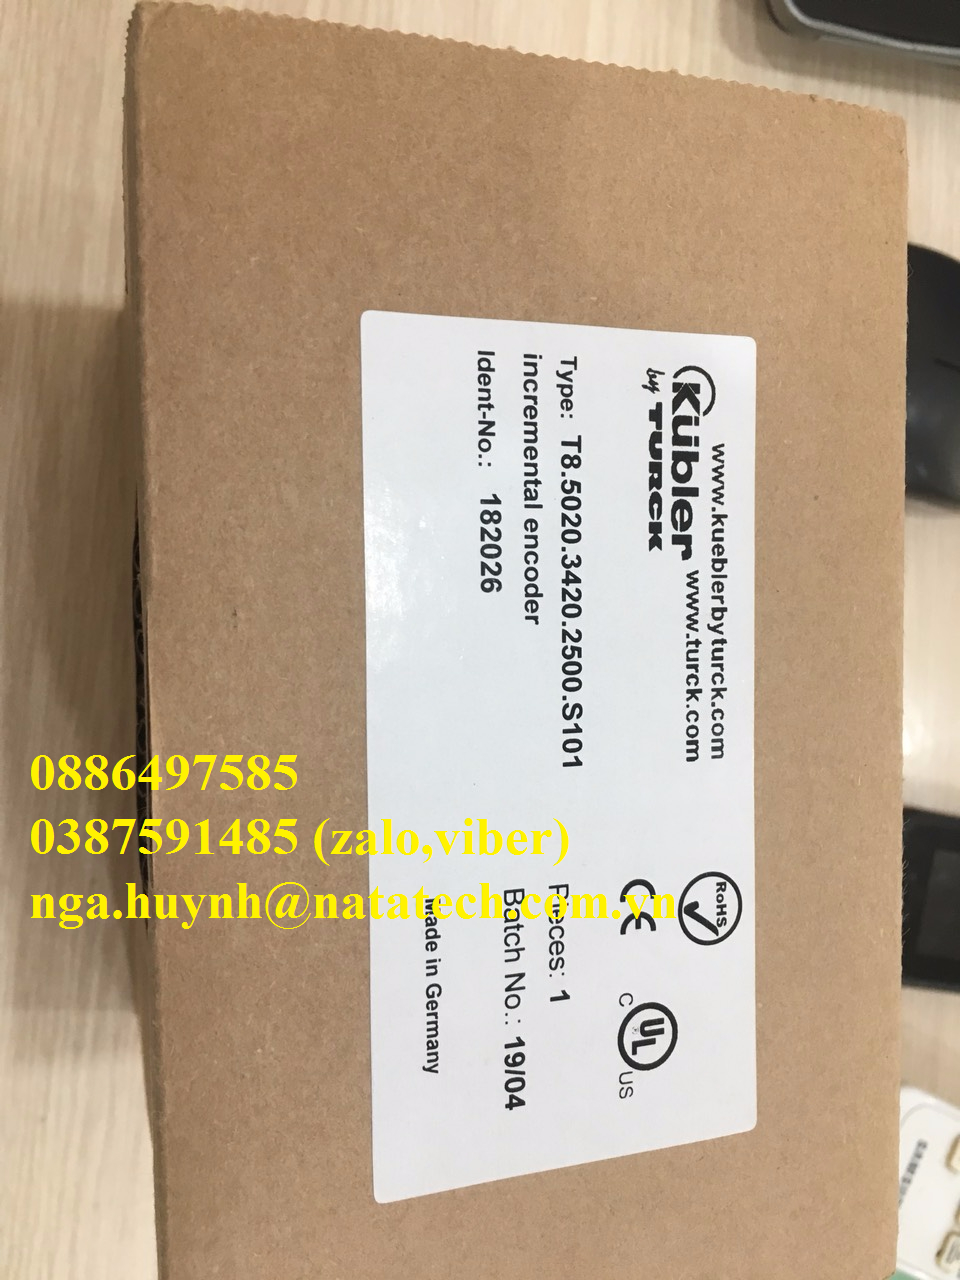 T8.5020.3420.2500.S101 Encoder Kubler